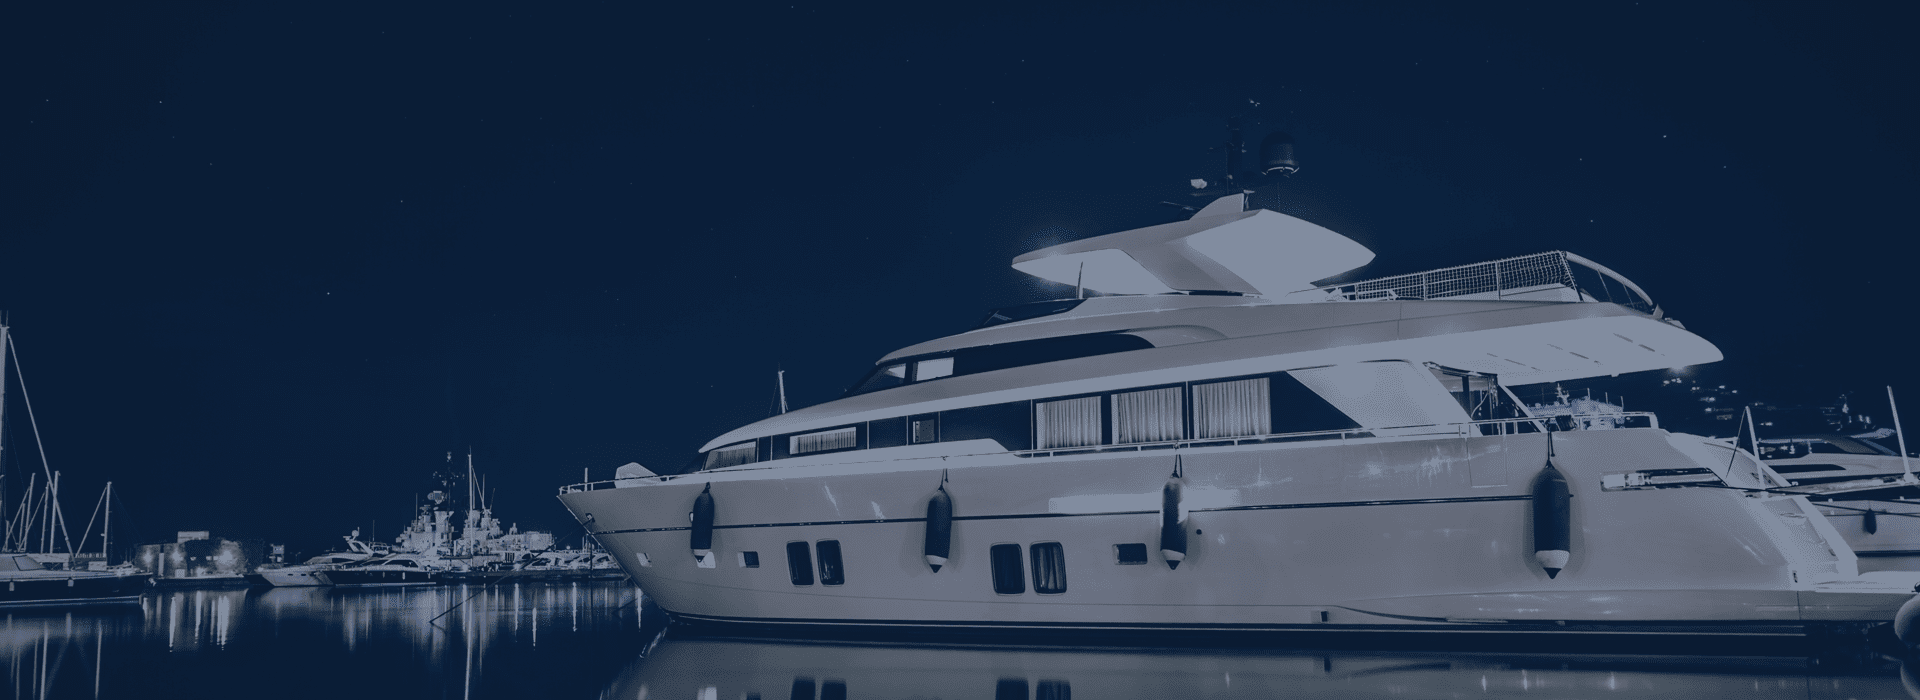 Yacht-at-Night-0717